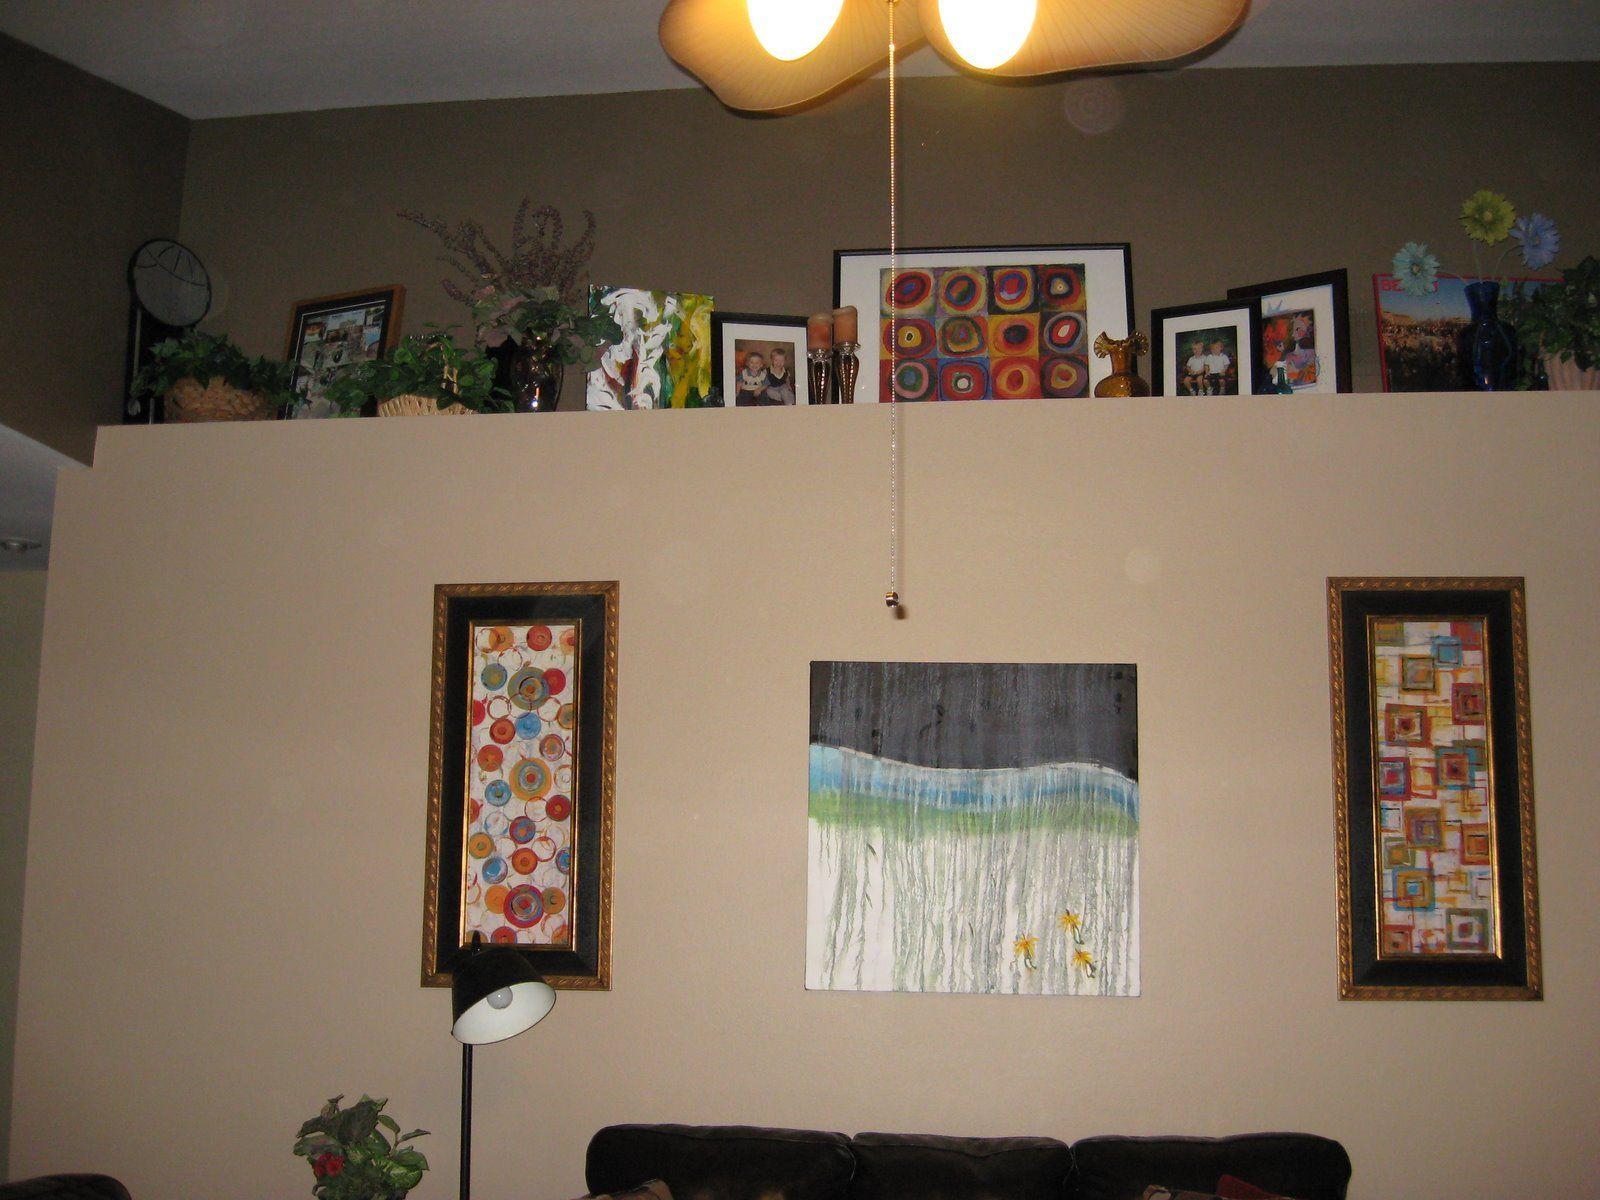 ledge decor No place like home Pinterest